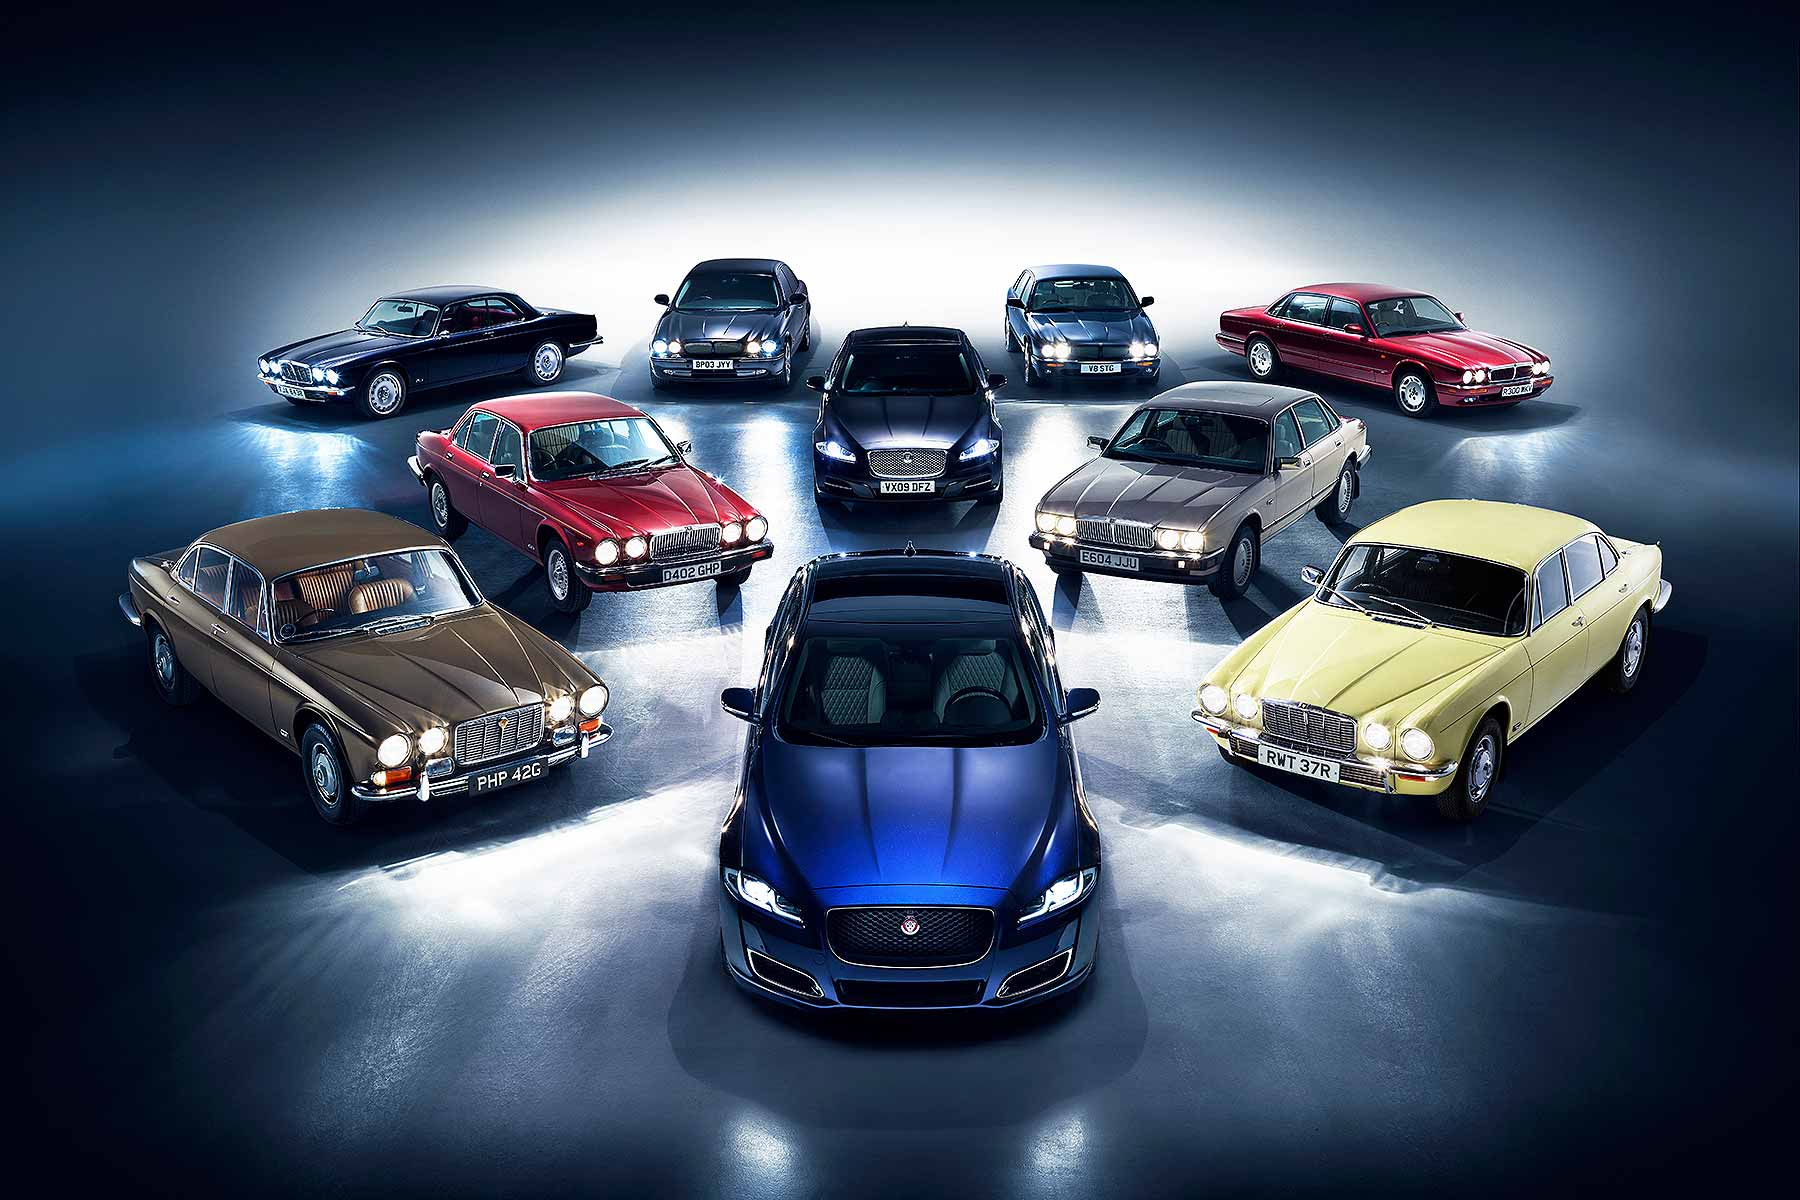 Jaguar XJ 1968 to 2018